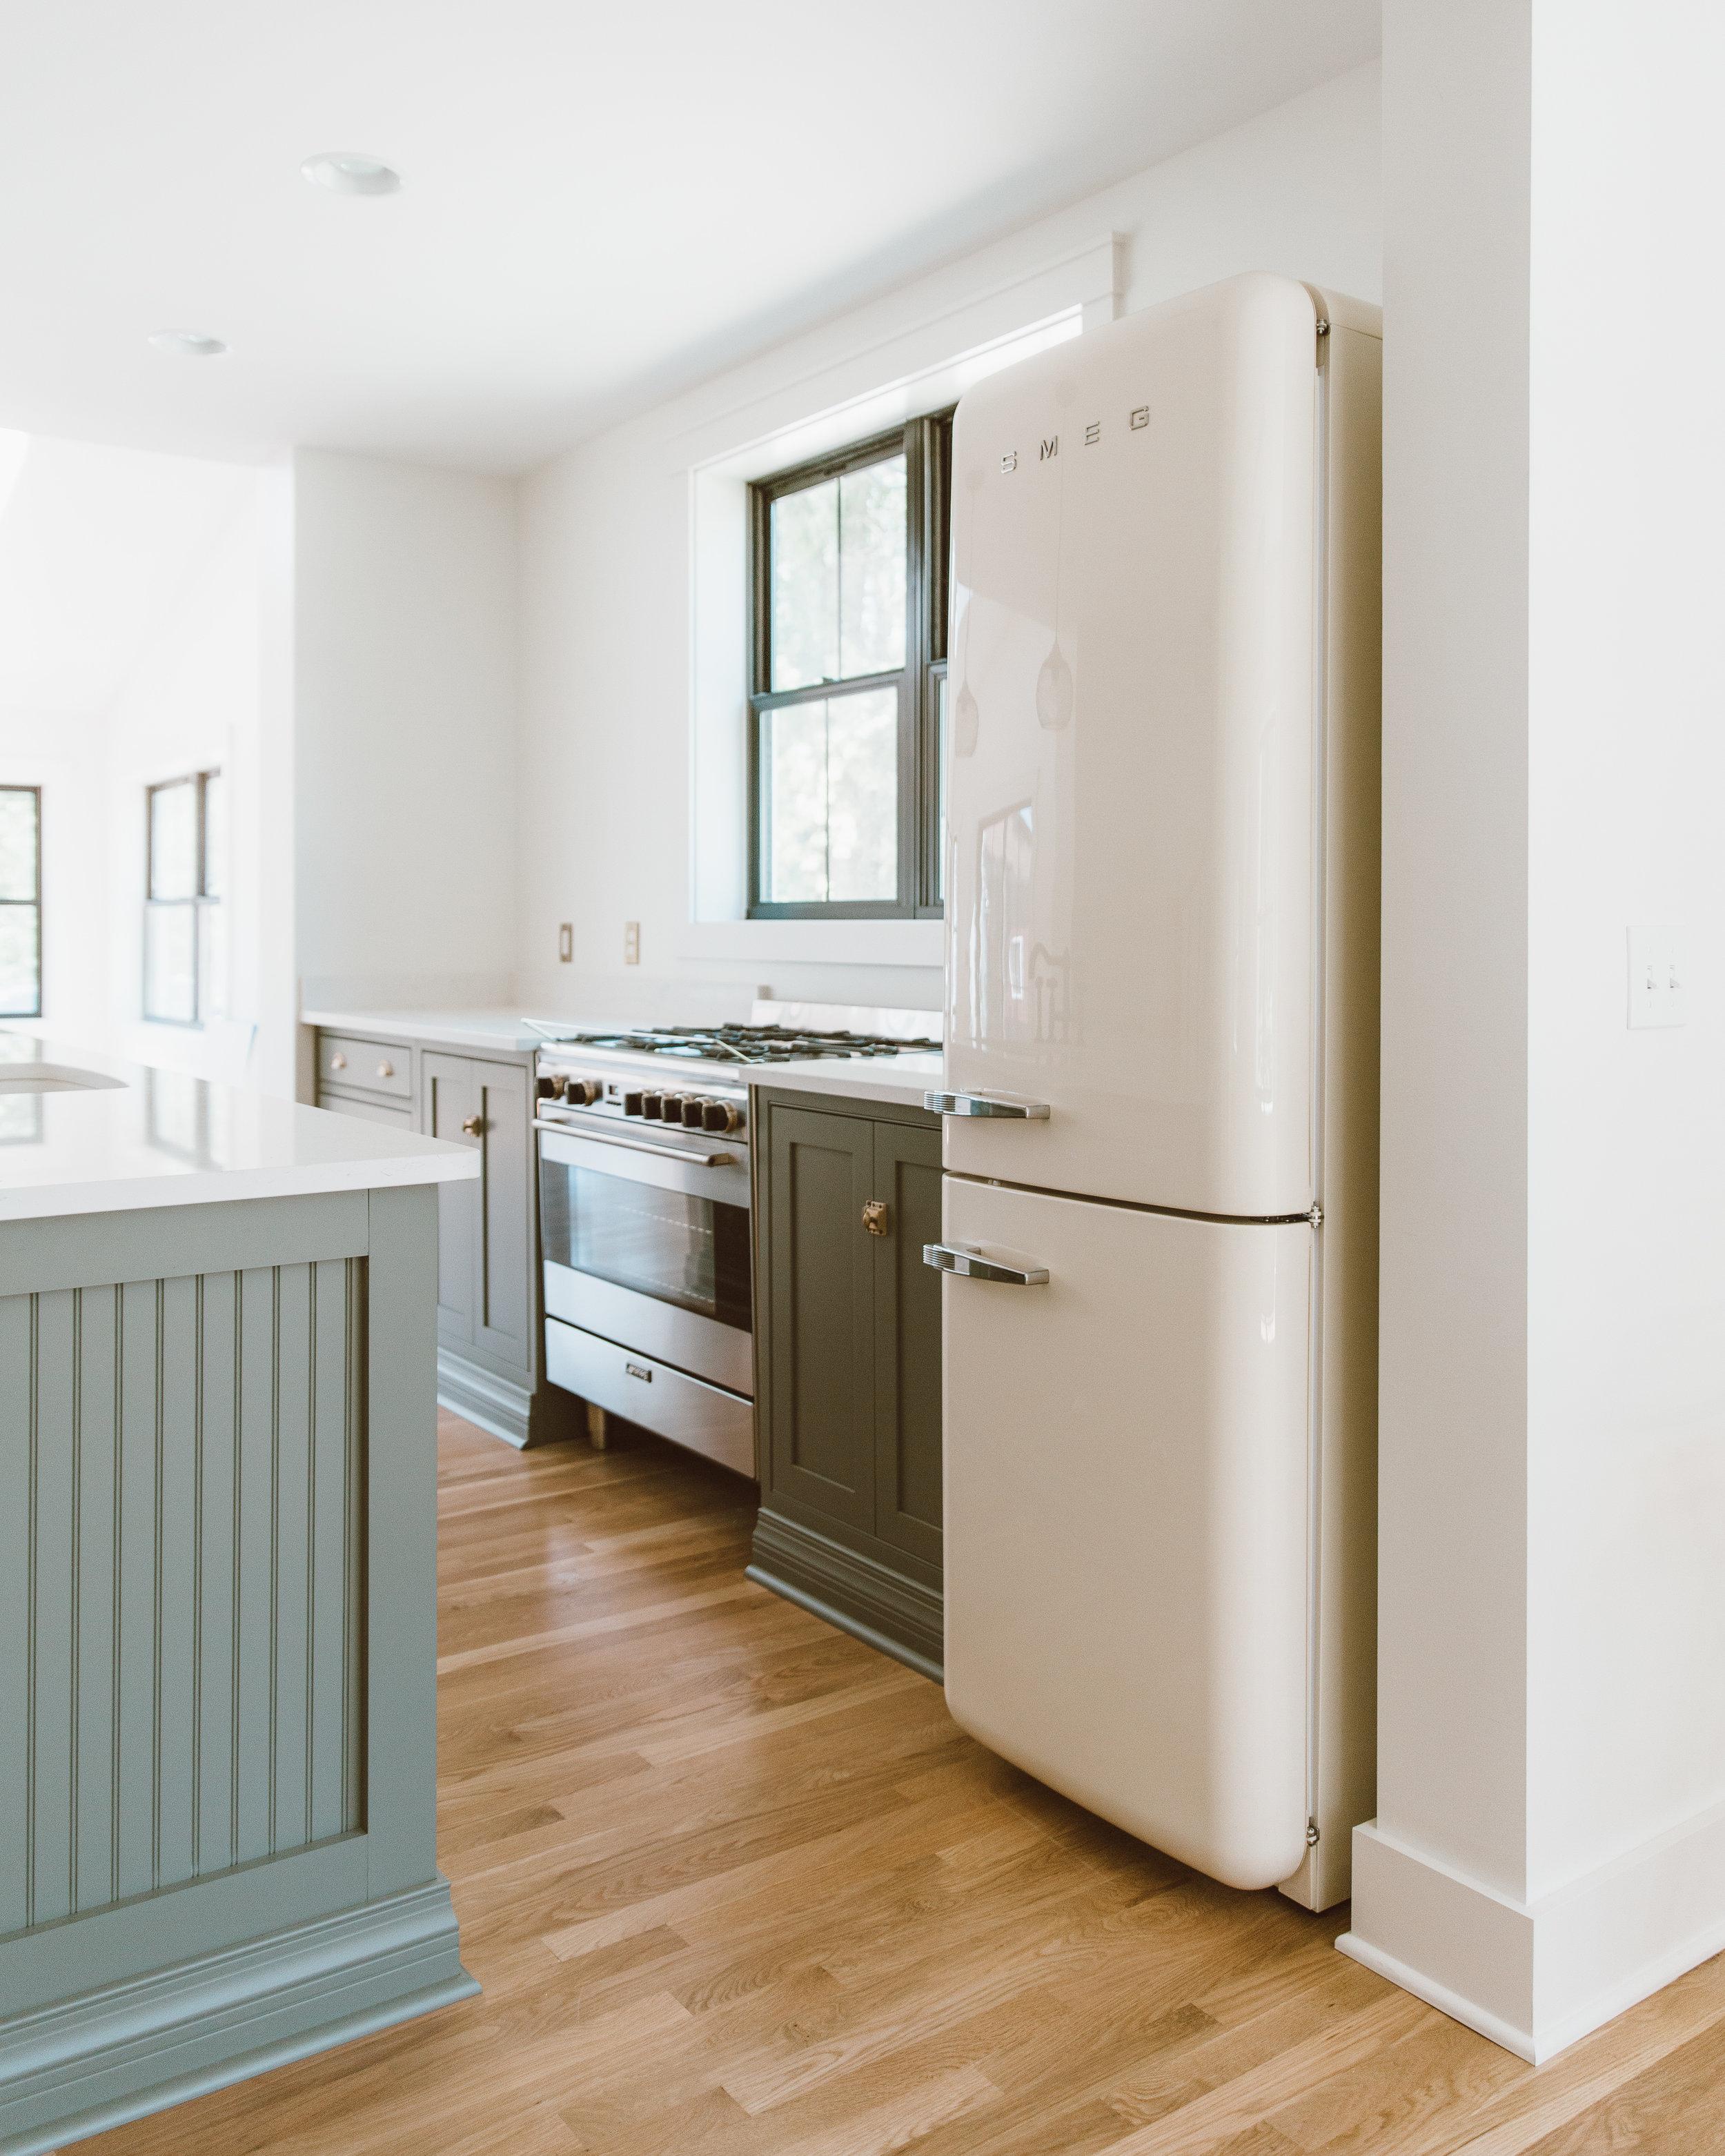 forthehome-nostalgic-warehouse-kitchen-cabinet-hardware02.jpg